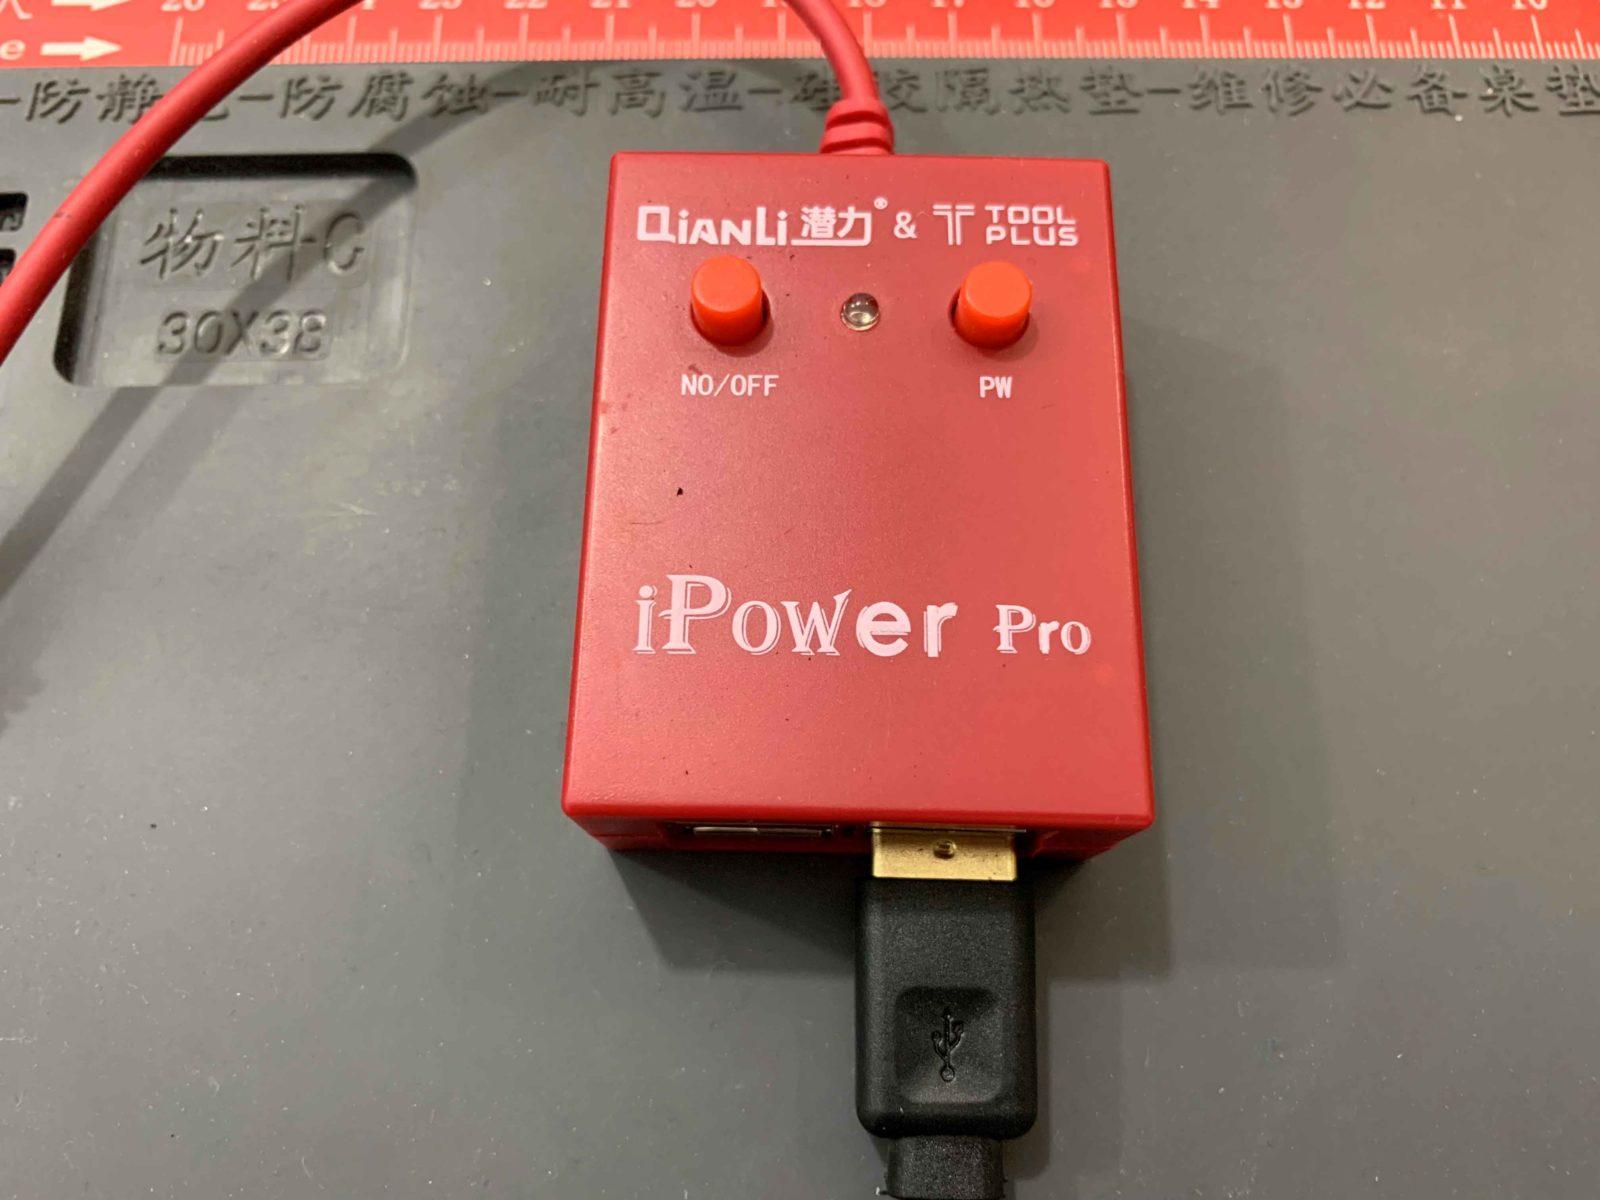 iPower Pro